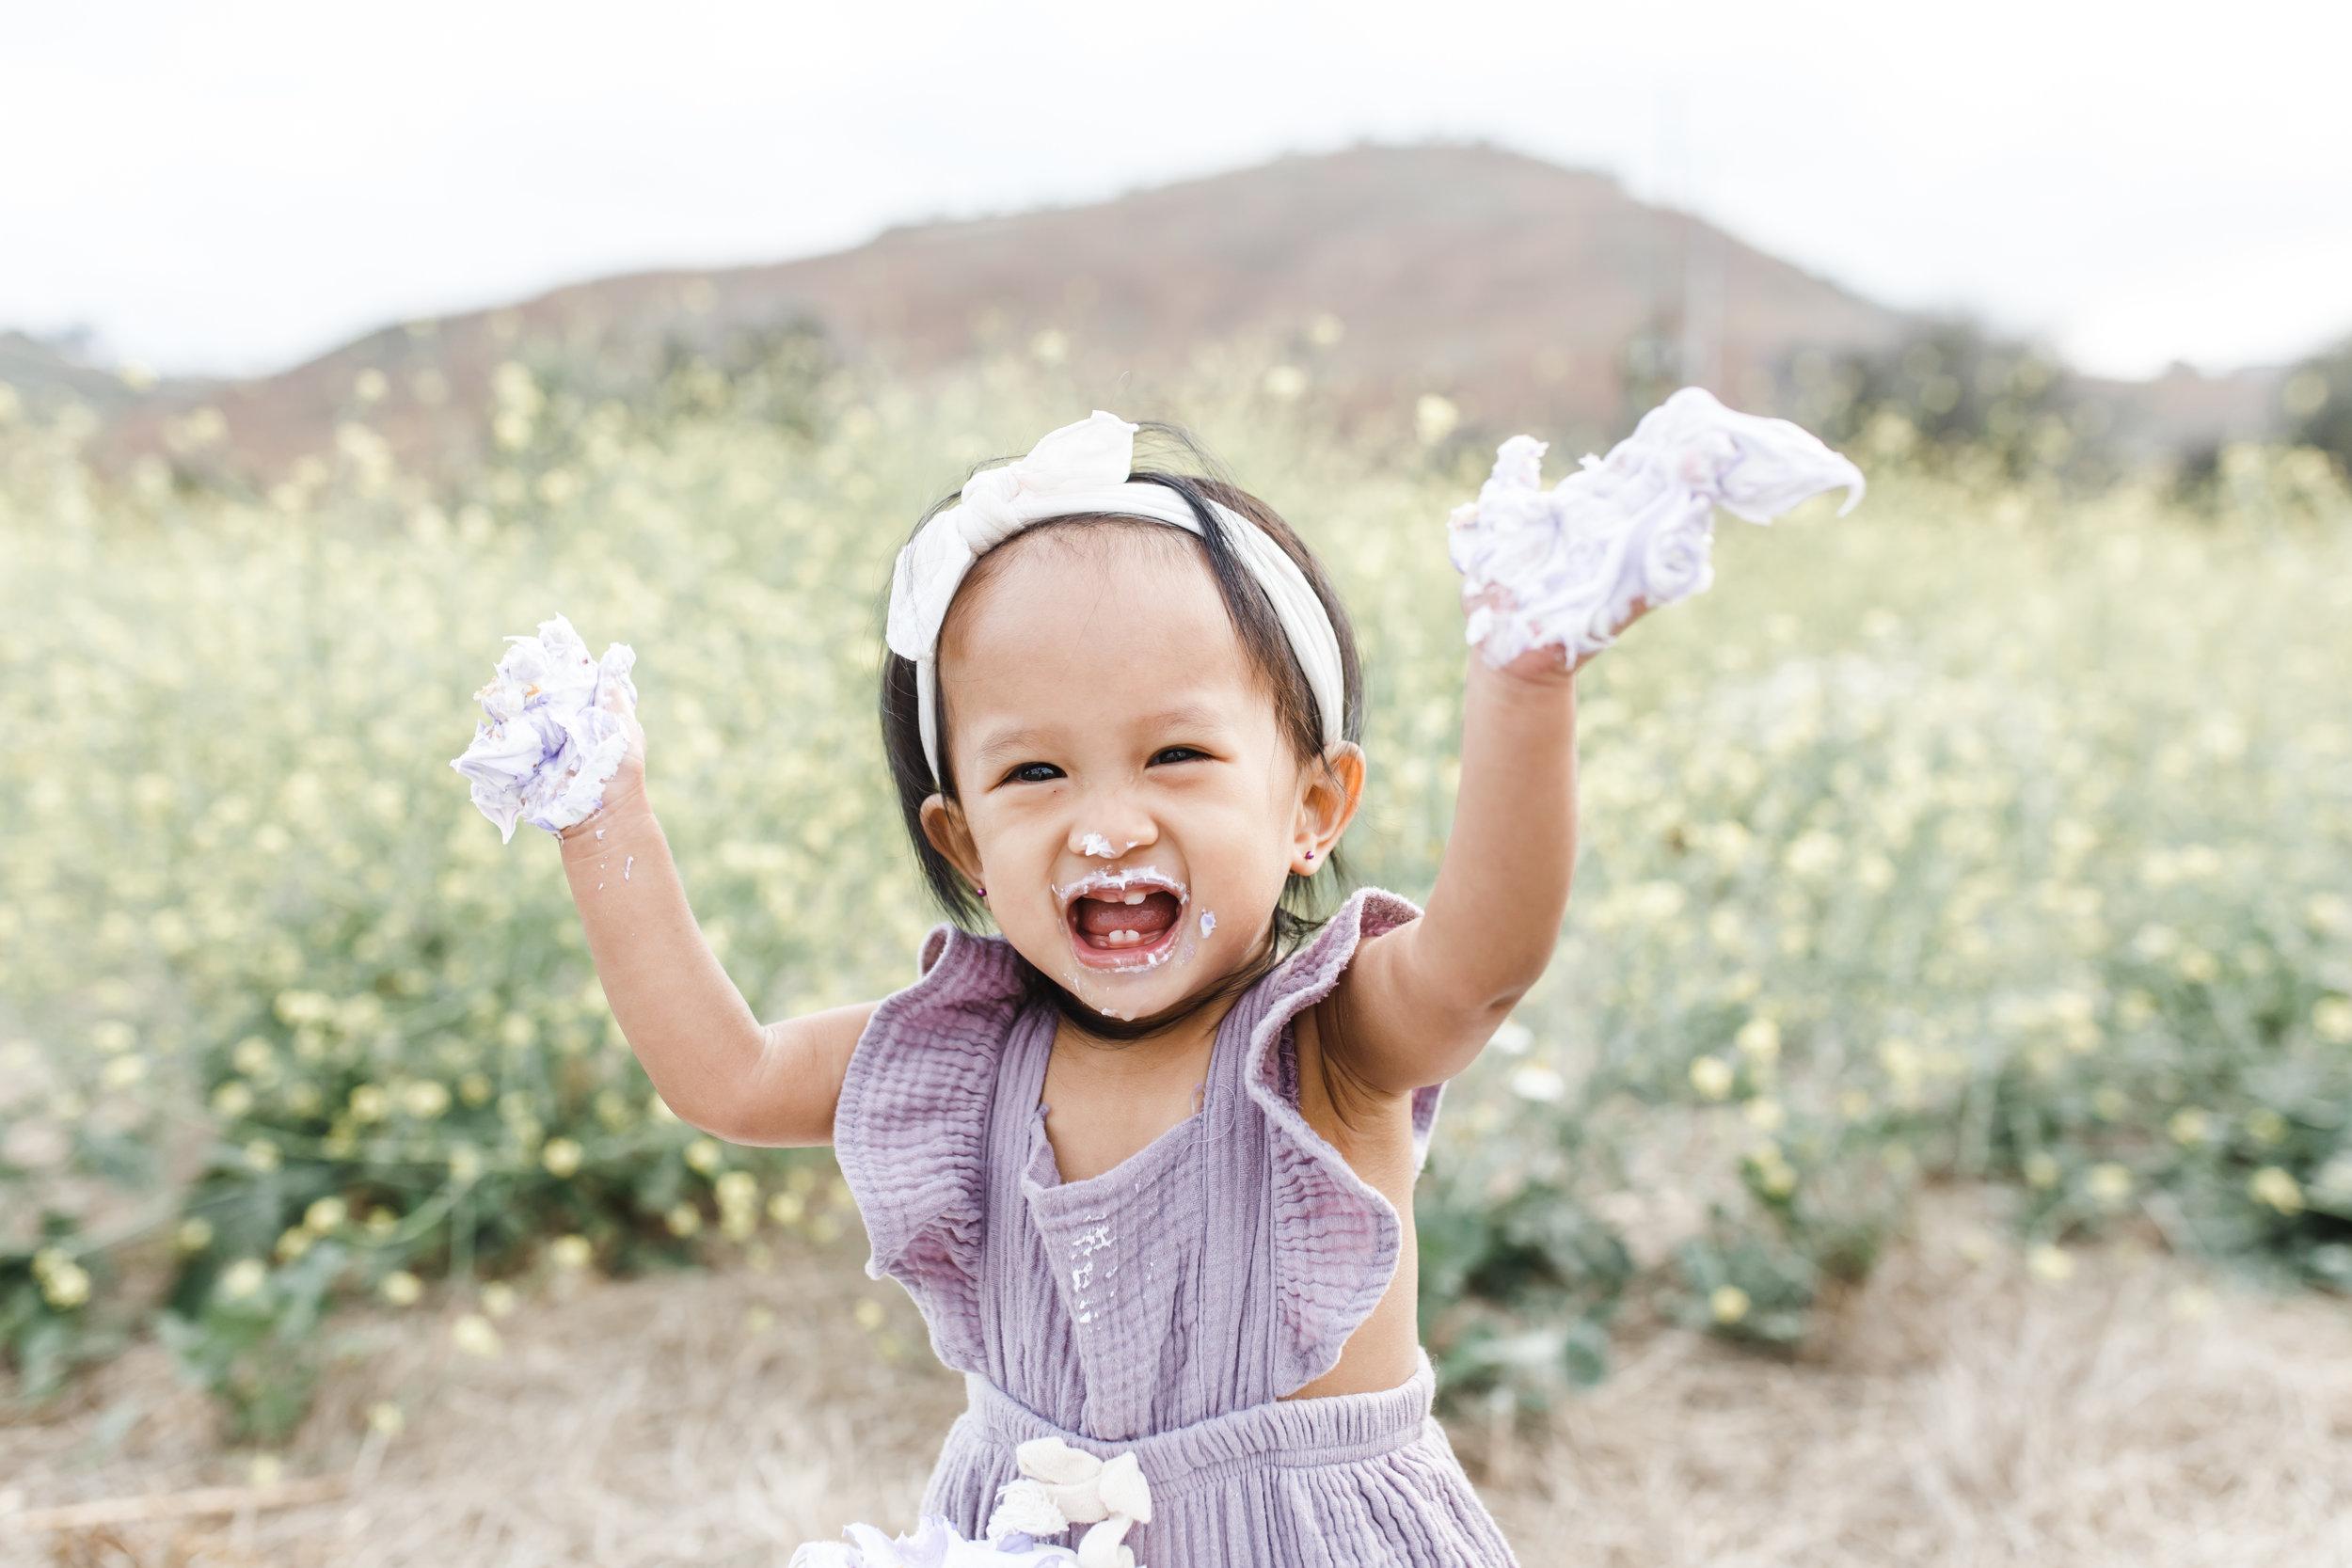 Dana PointInfant Photographer  ||  little girl in a Field for her Cake Smash 1st birthday